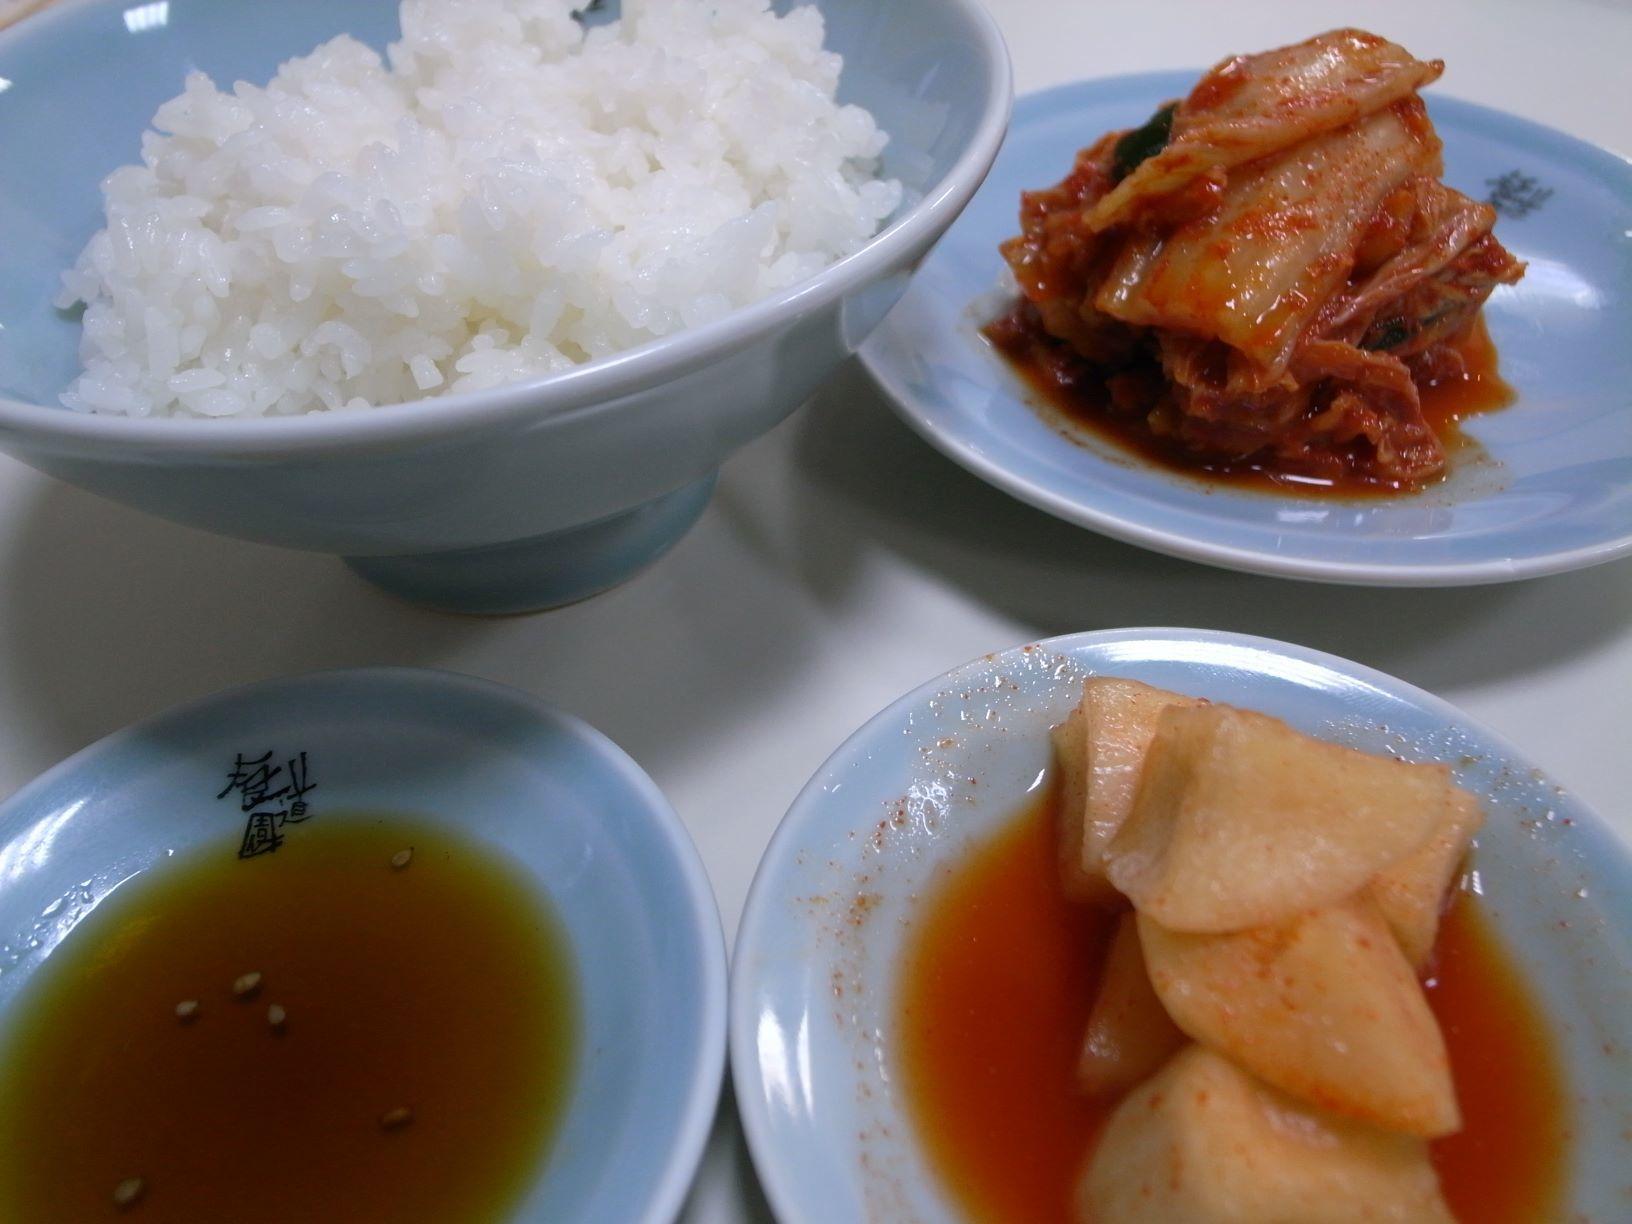 エア外食(盛岡冷麺)_d0389370_19194704.jpg